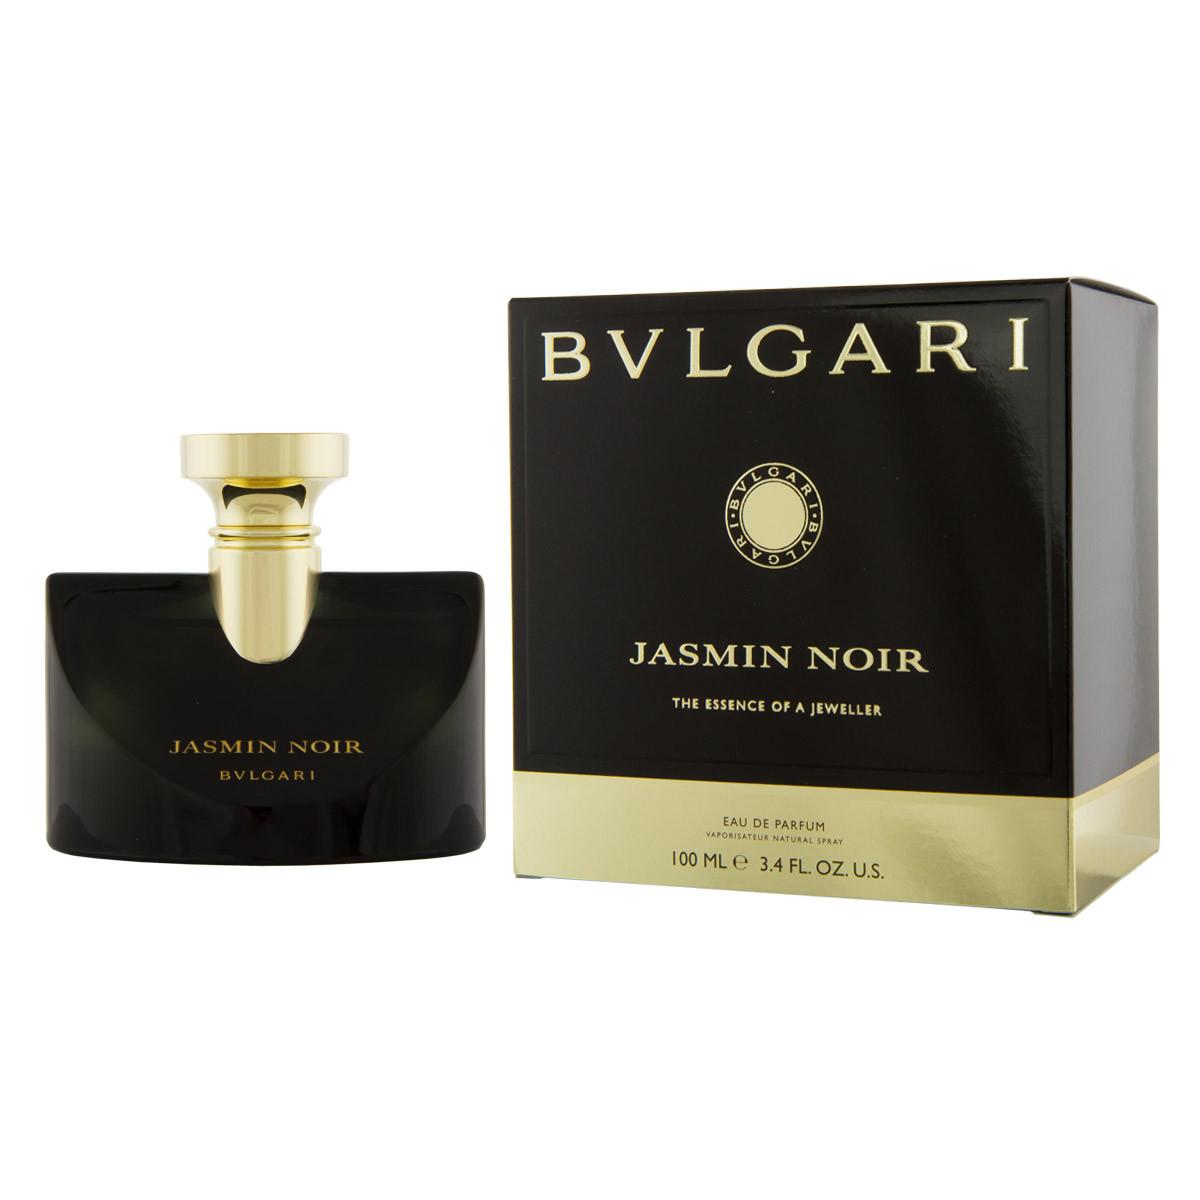 bvlgari jasmin noir eau de parfum 100 ml woman jasmin noir bvlgari marken. Black Bedroom Furniture Sets. Home Design Ideas